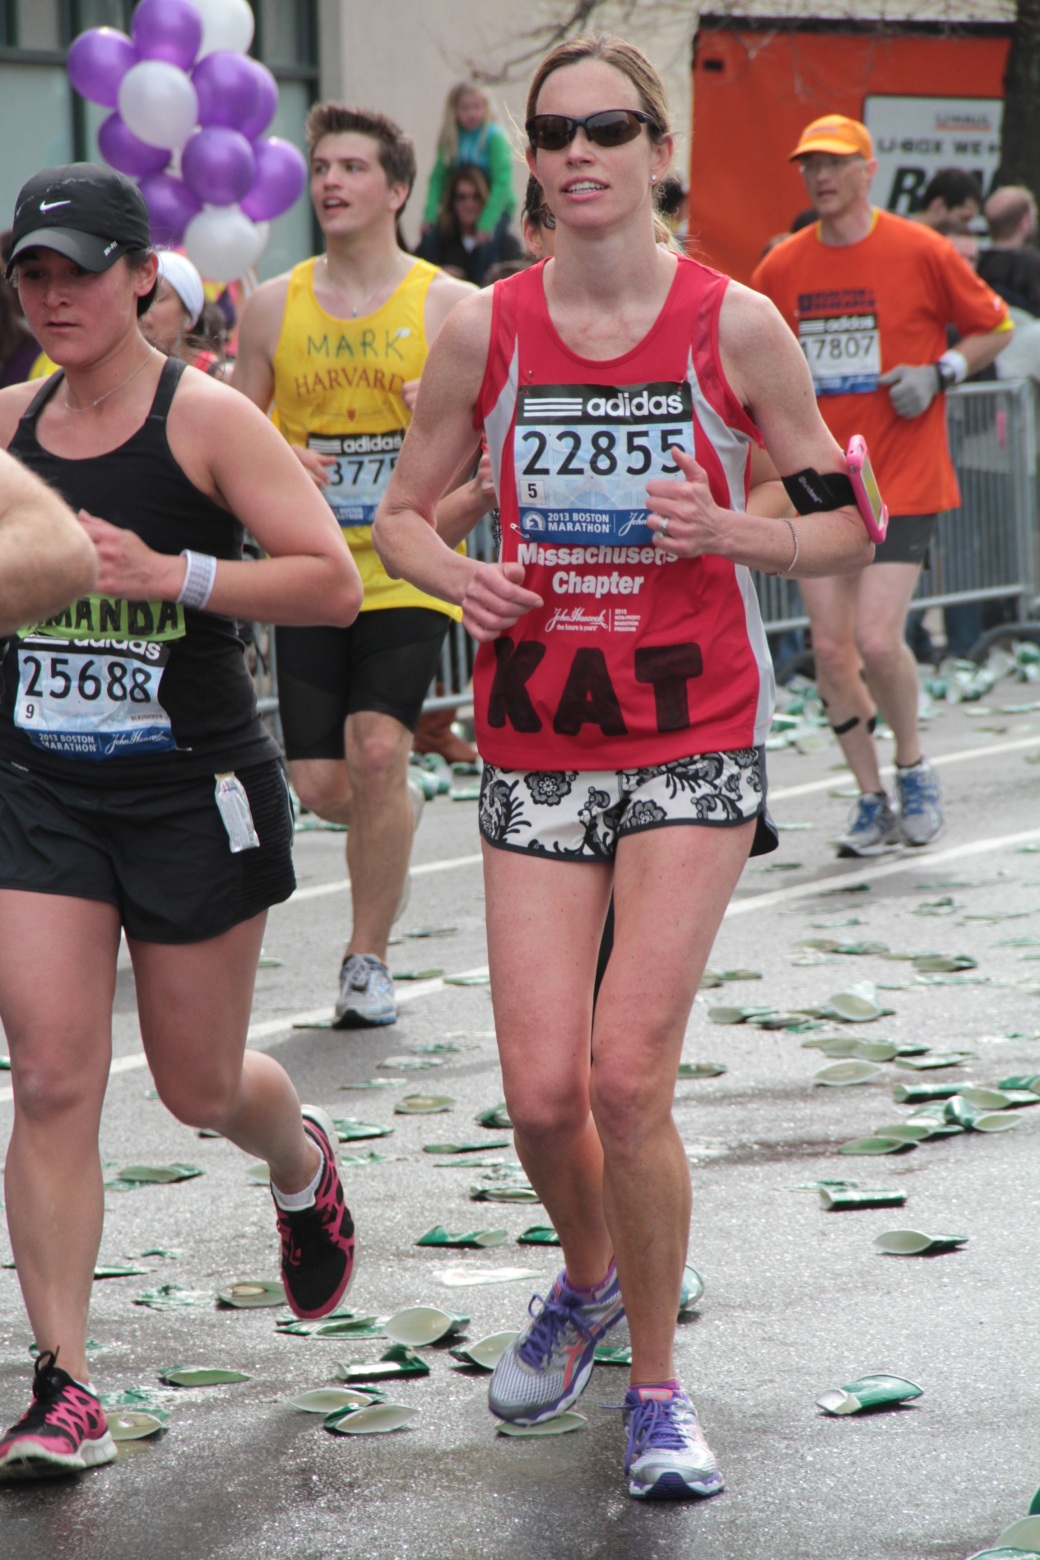 boston marathon 2013 22855 kat